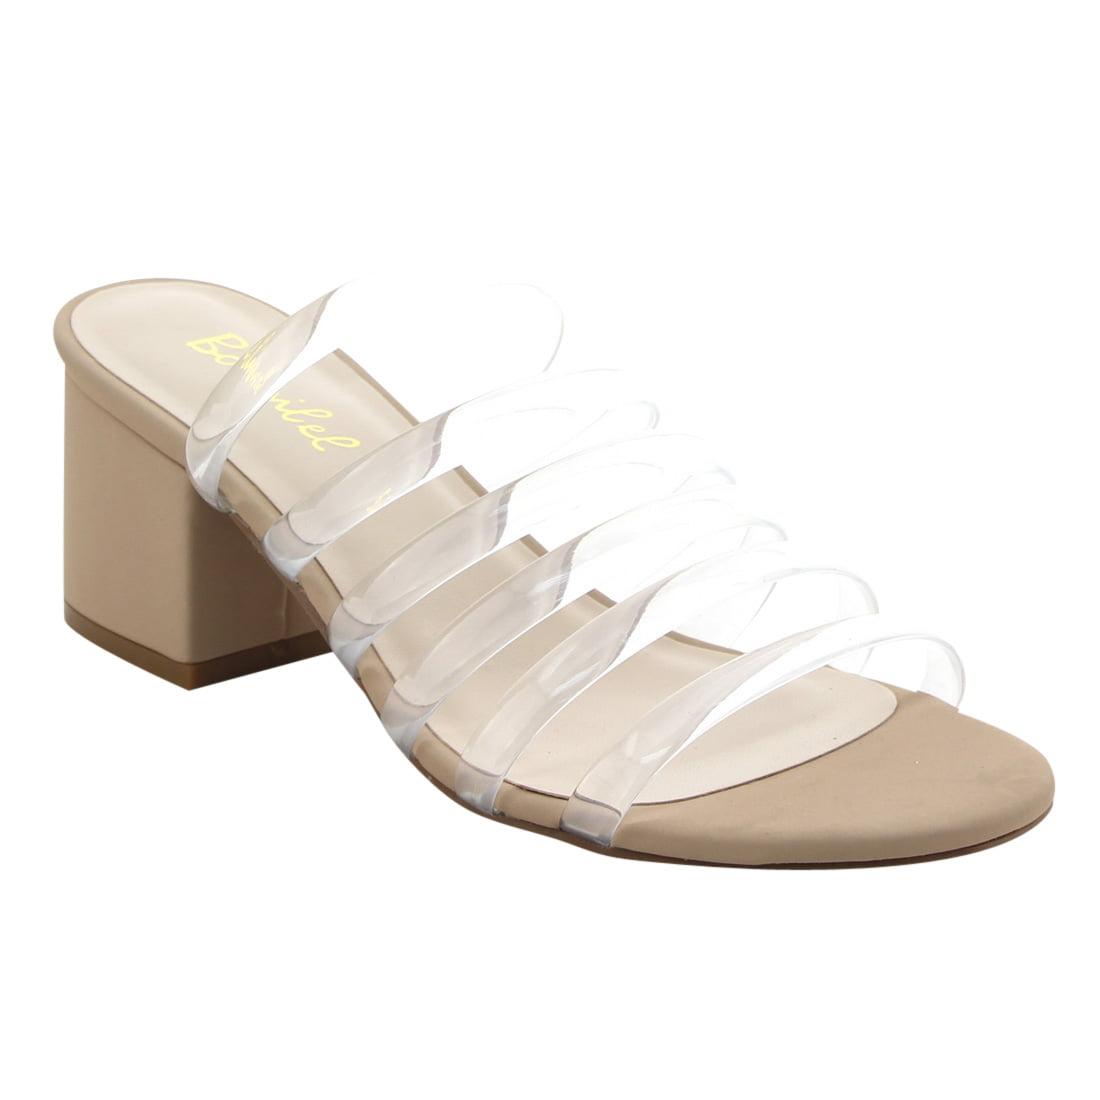 BONNIBEL FJ65 Women's Block Heel Slip On Clear Strap Slides Sandals